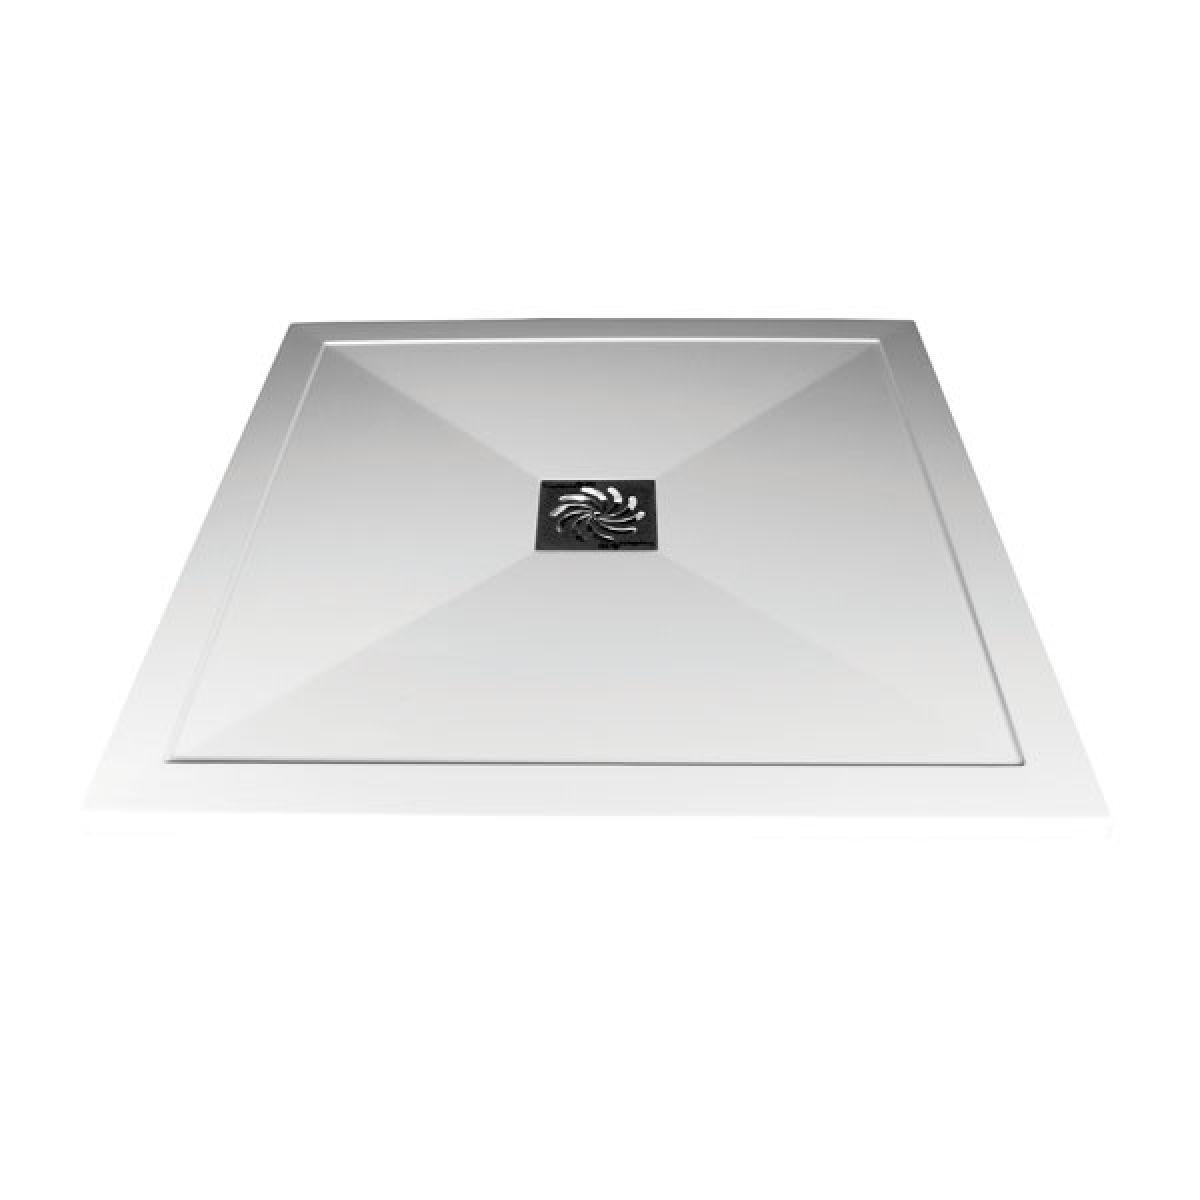 Frontline Slimline Square Shower Tray 800 x 800mm